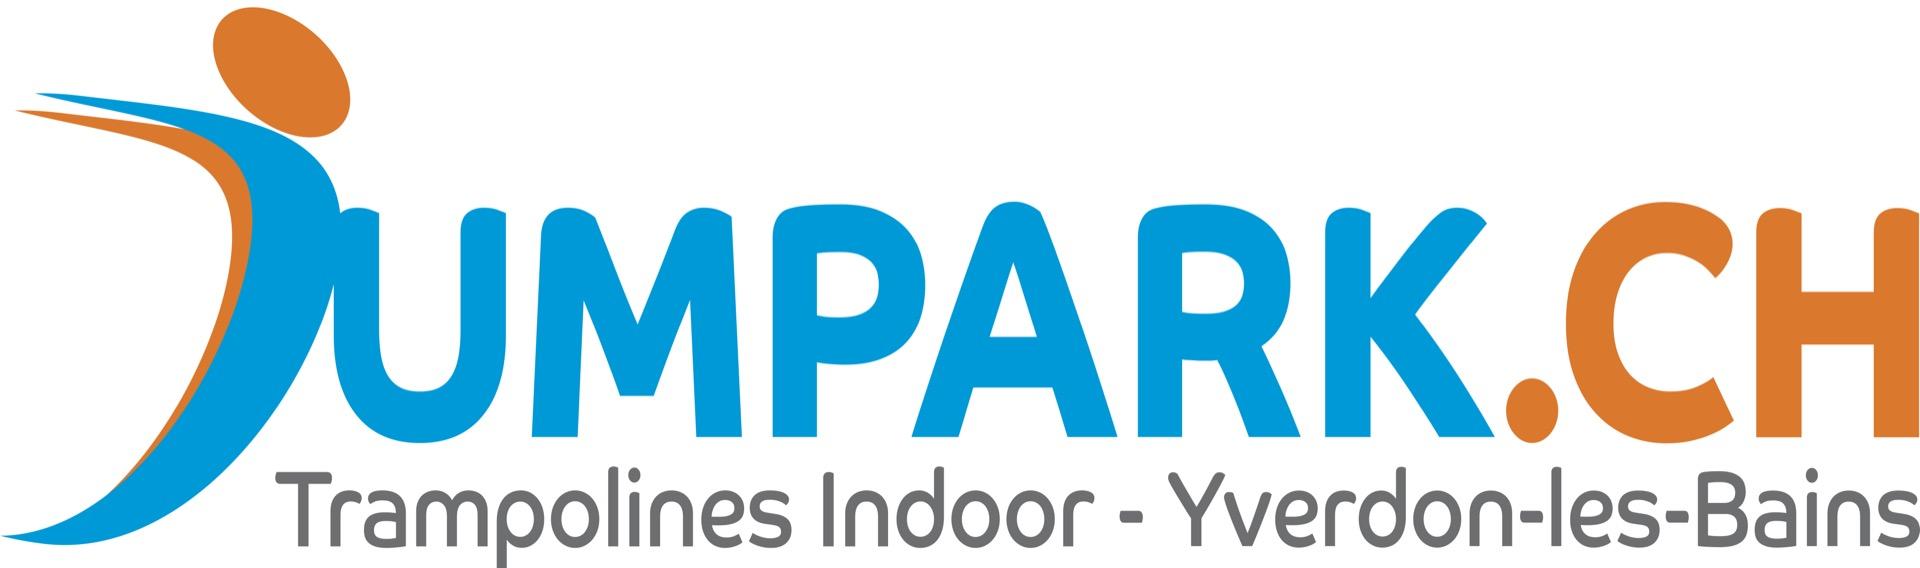 jumpark_banner